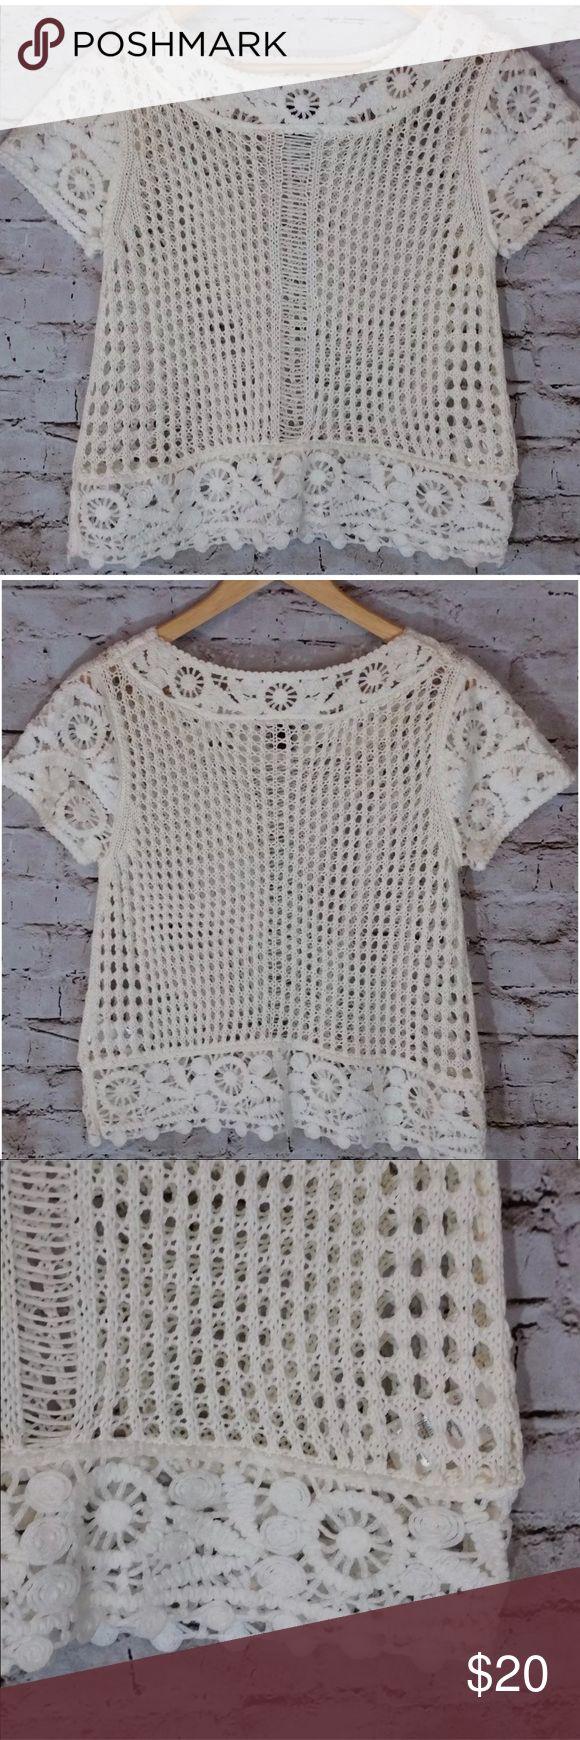 "H & M Short Sleeve Crochet Top H&M Cream Crochet Short Sleeve Top Shirt   Excellent Mint Condition  Size Small - measured lying flat  Bust - 19"" Shoulder seam to seam - 16"" Length - 21 1/4""  Condition - Excellent with no flaws. H&M Tops Tees - Short Sleeve"